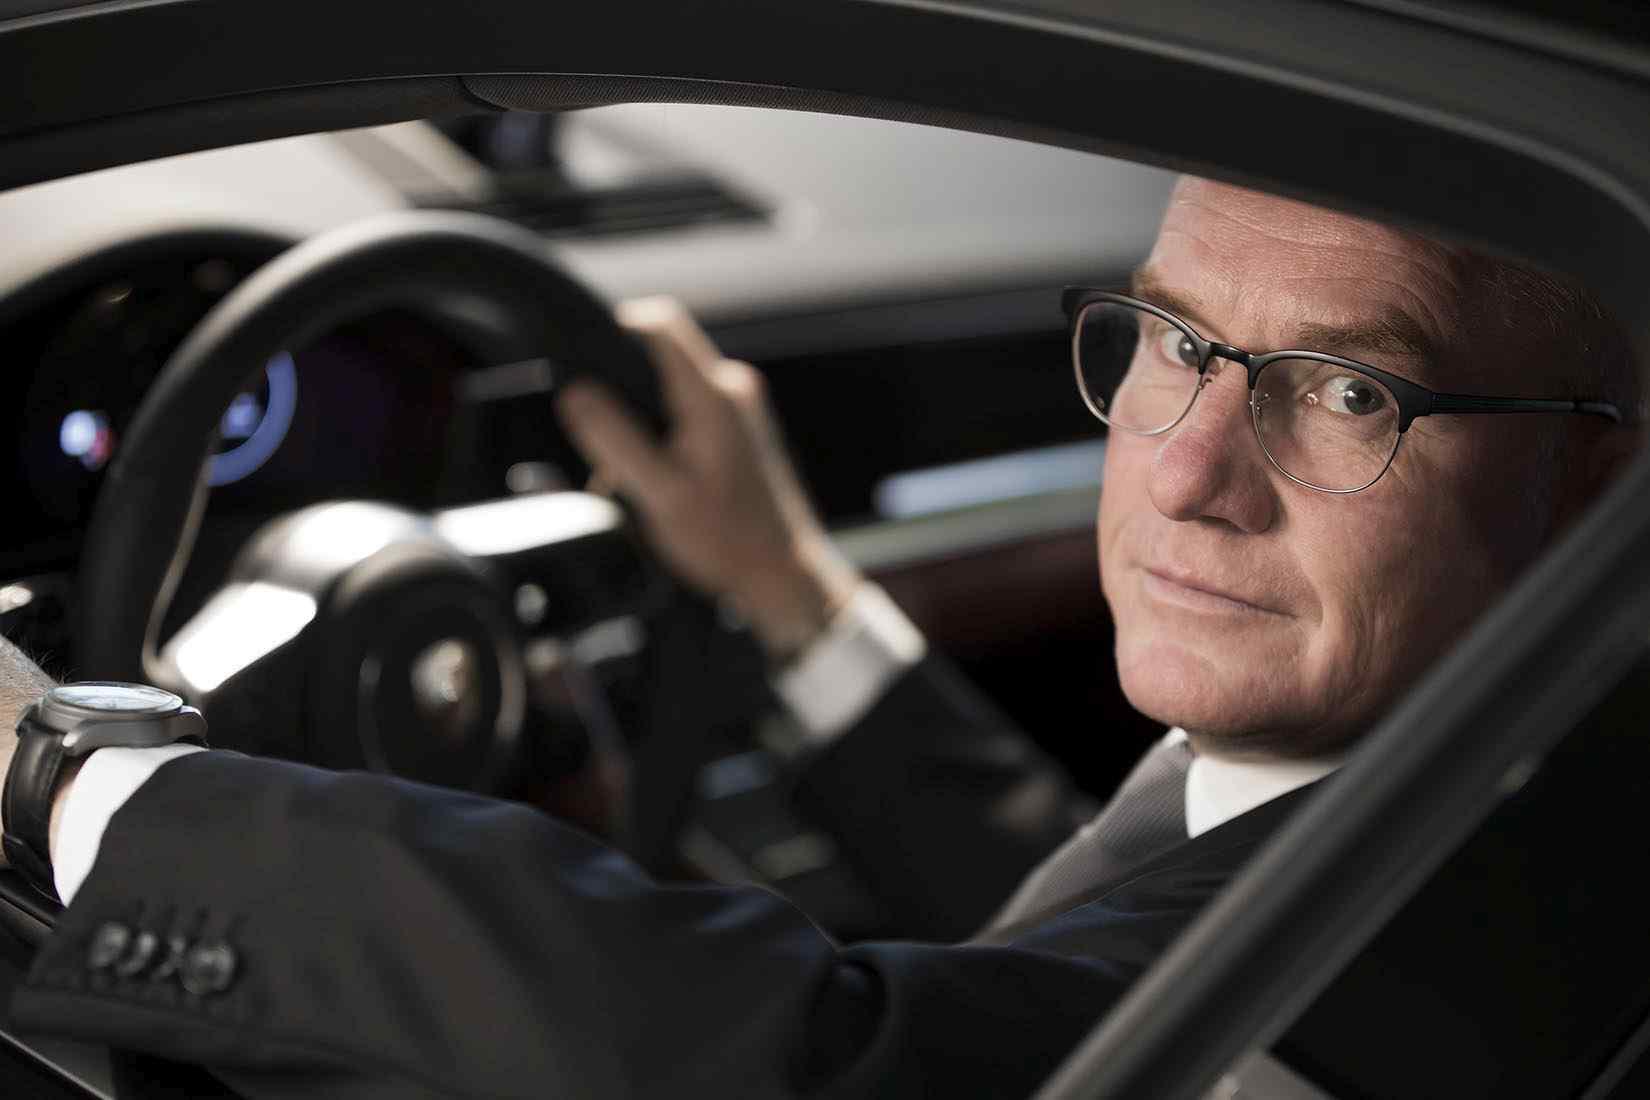 Porsche Design spectacles